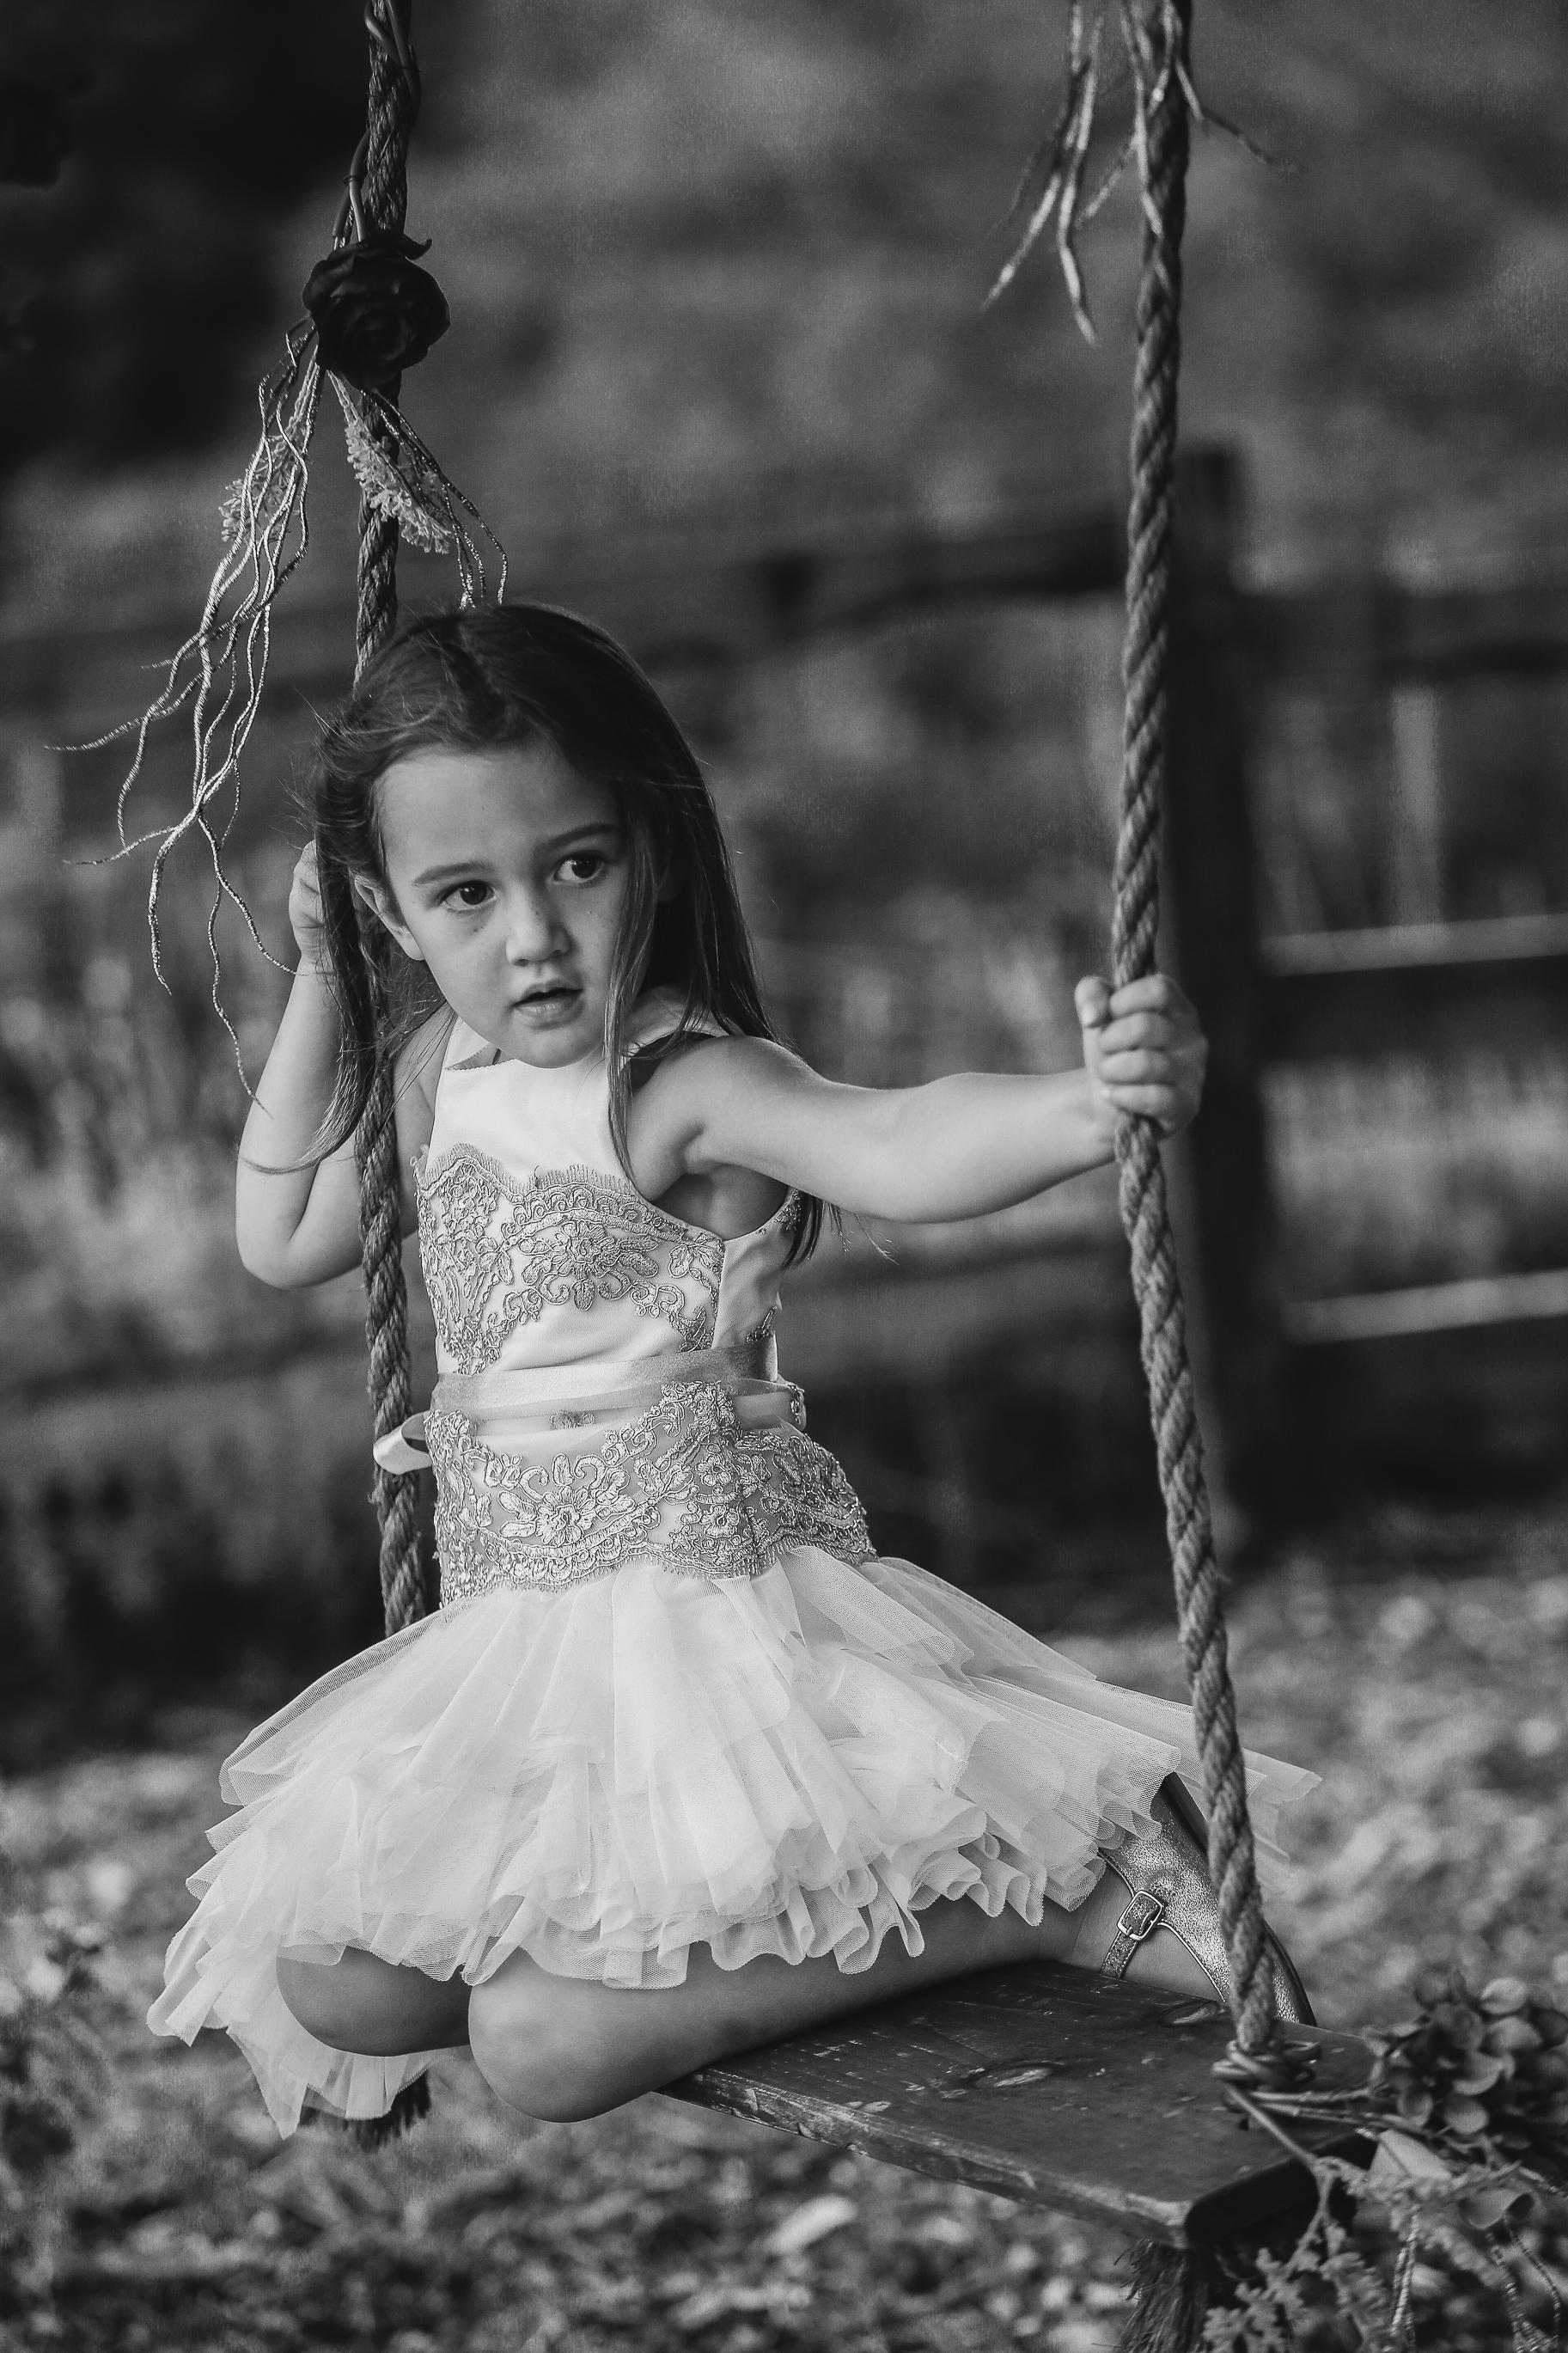 childrens photographer venice beach -5078.jpg